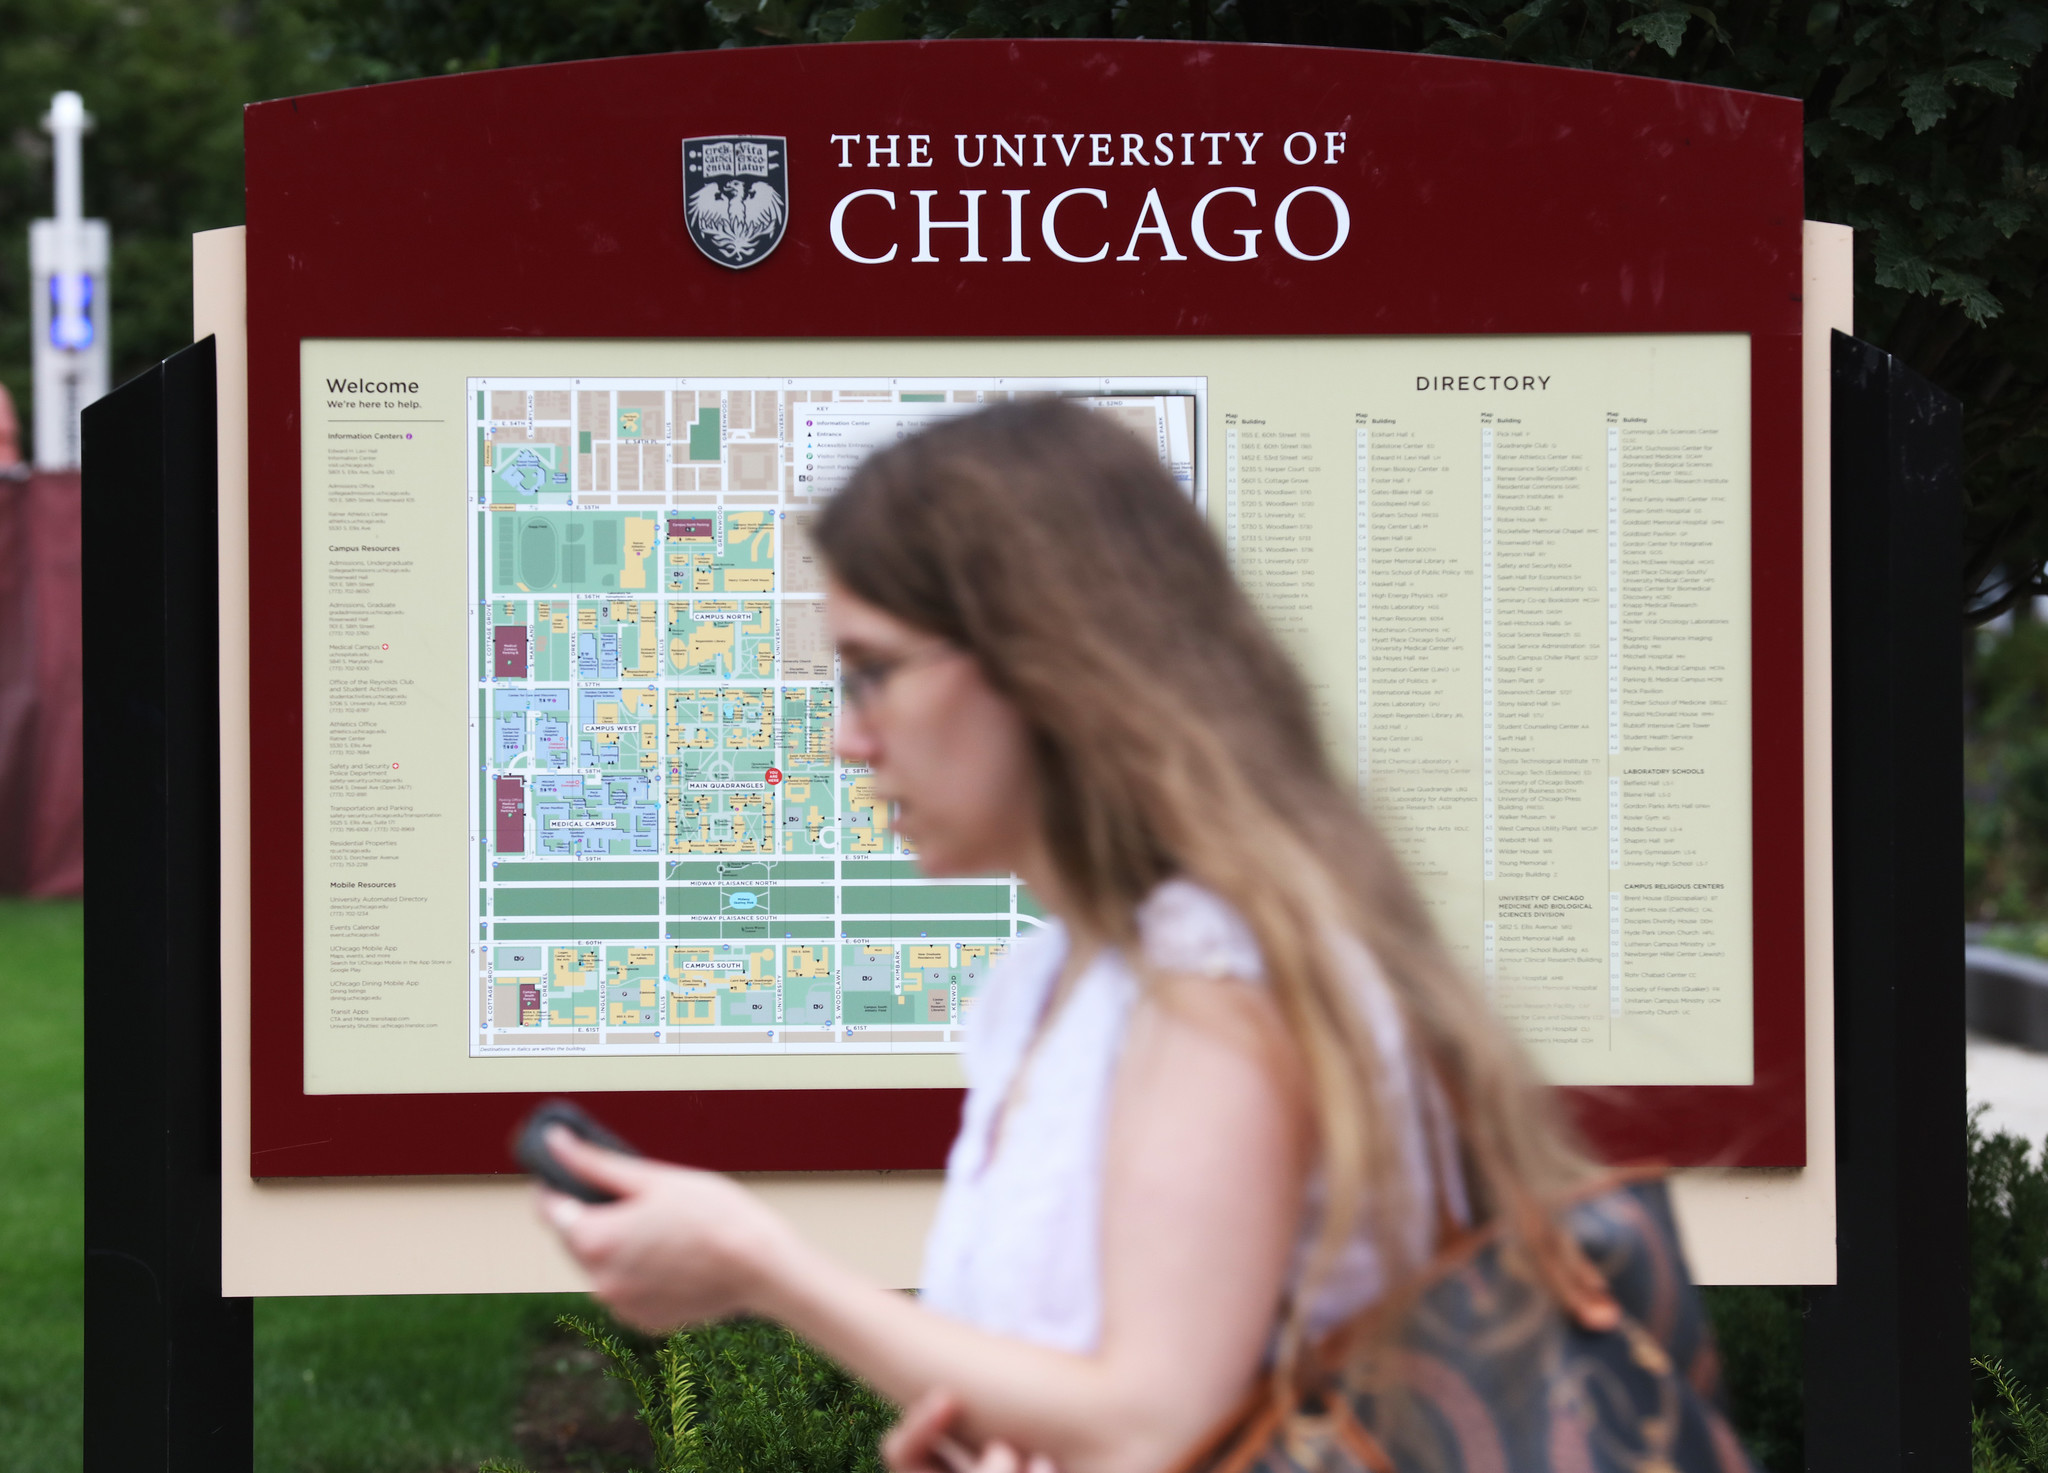 University Of Chicago Faces 1 Million Lawsuit Alleging Race